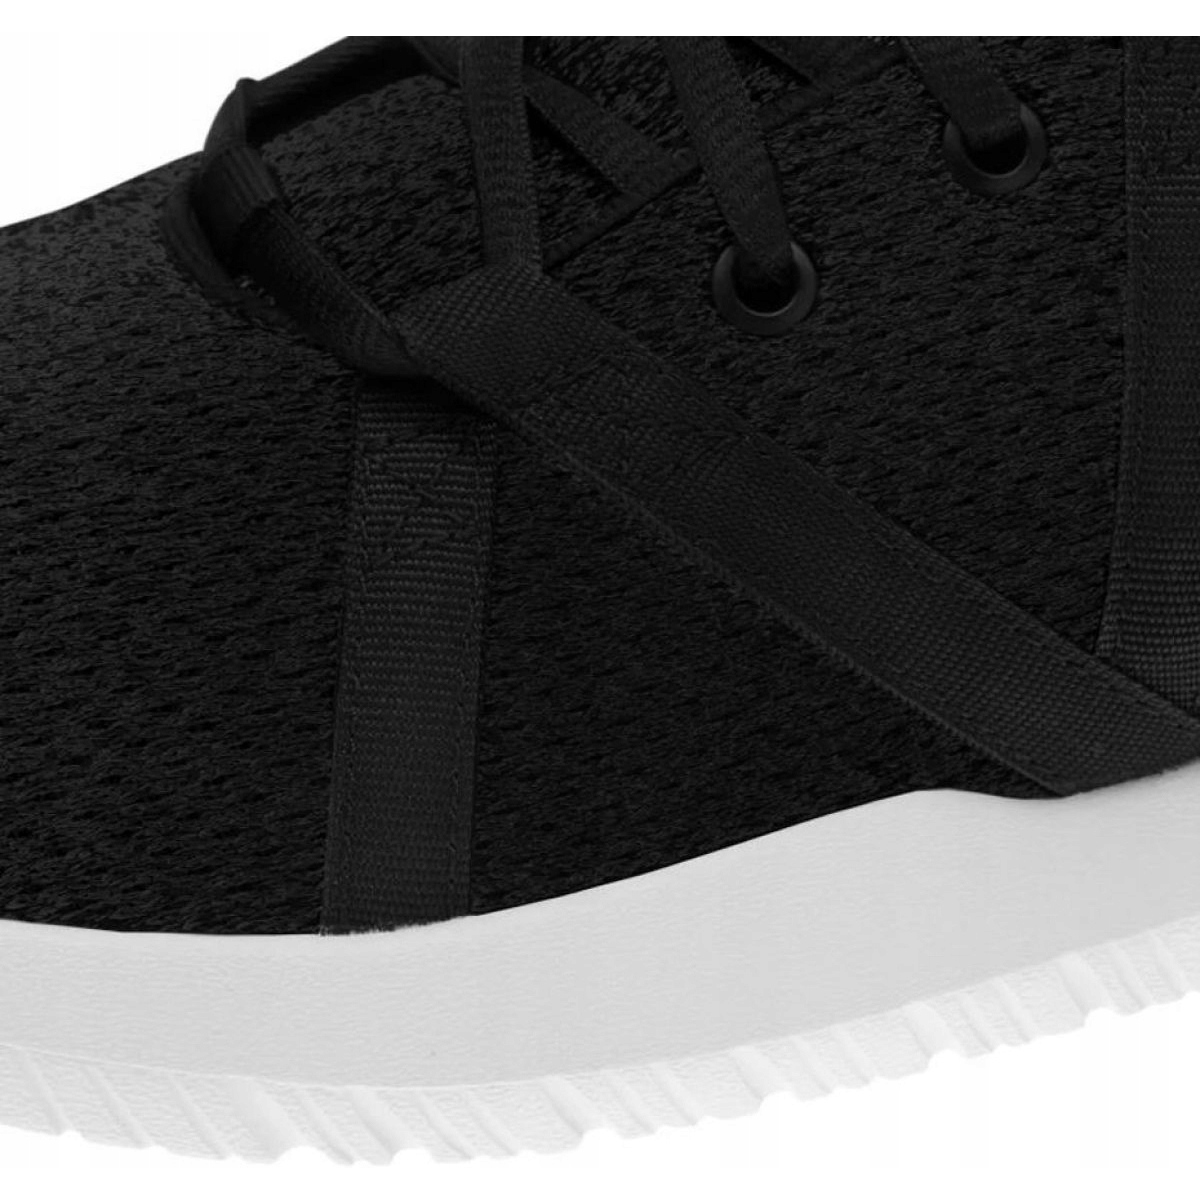 Chaussures-Reebok-Reago-Essential-M-CN4624-noir miniature 4